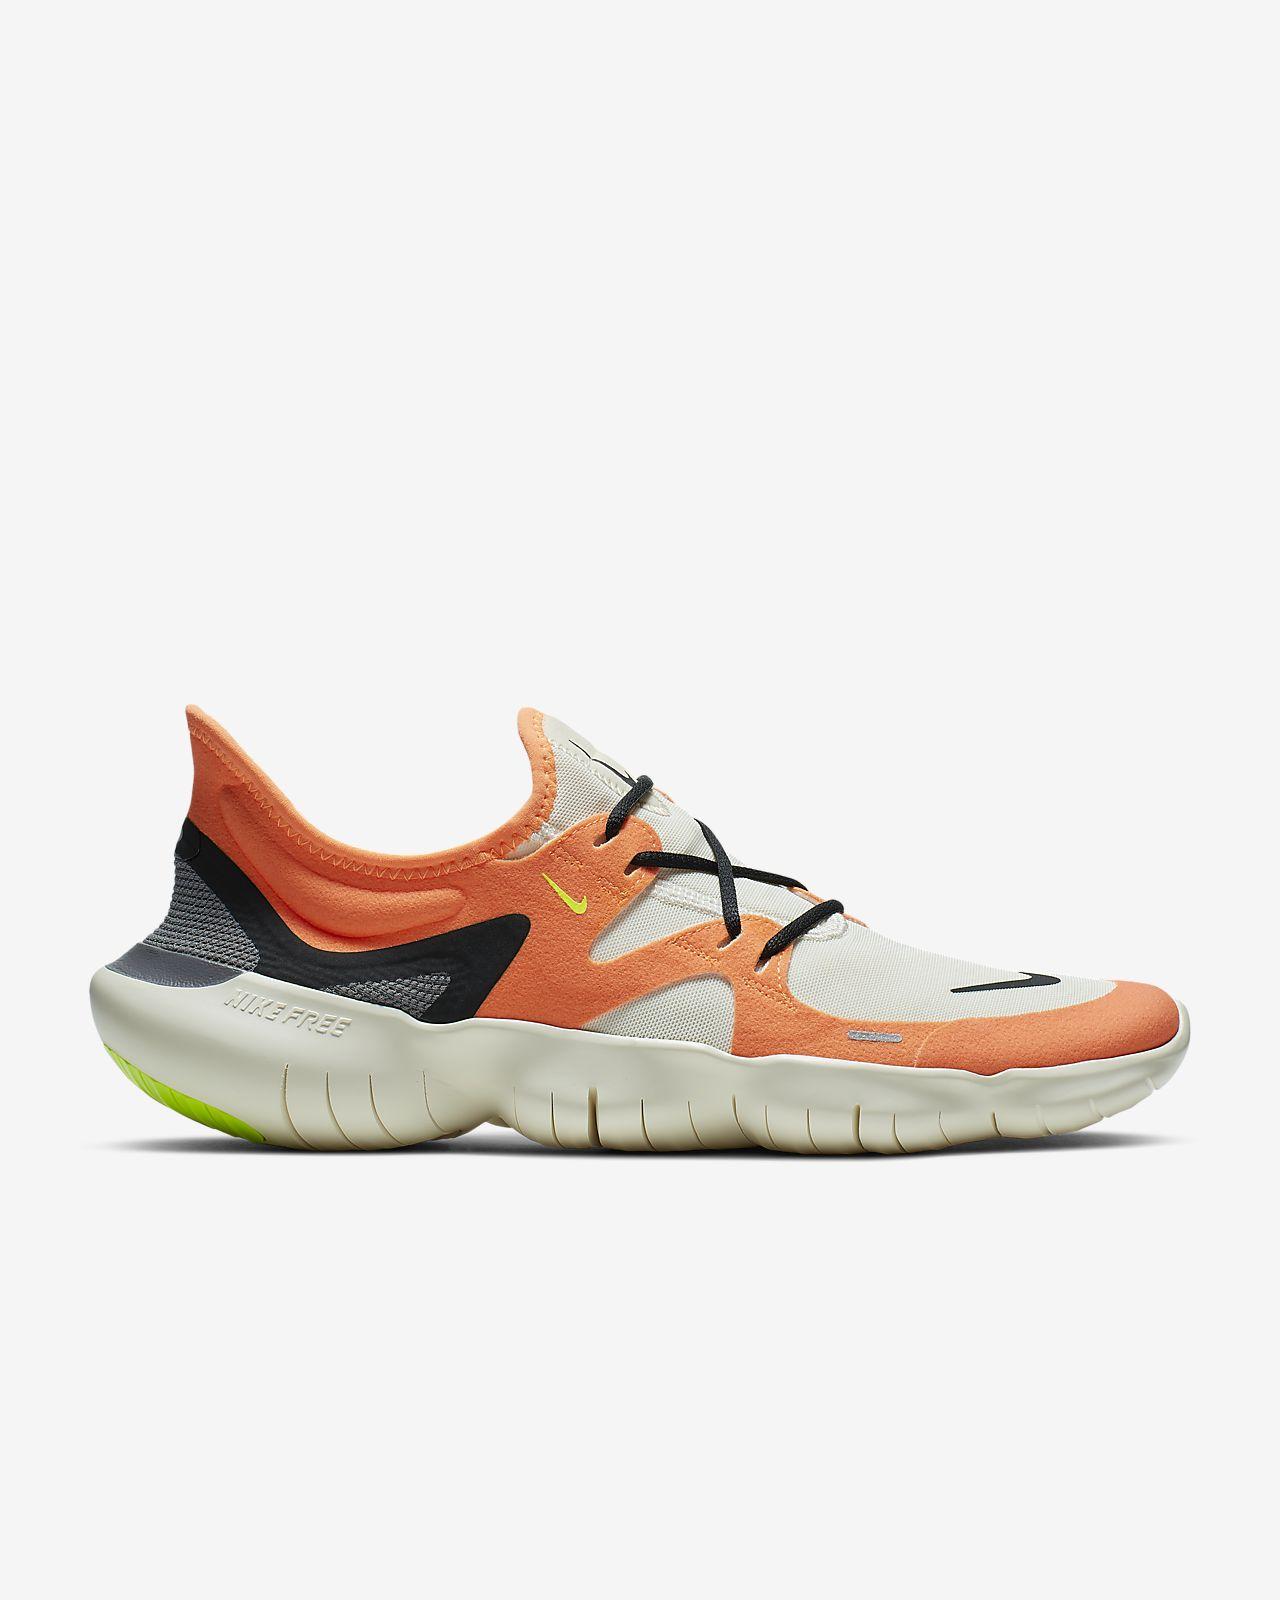 new style 90d0c cc19c Nike Free RN 5.0 NRG Men's Running Shoe